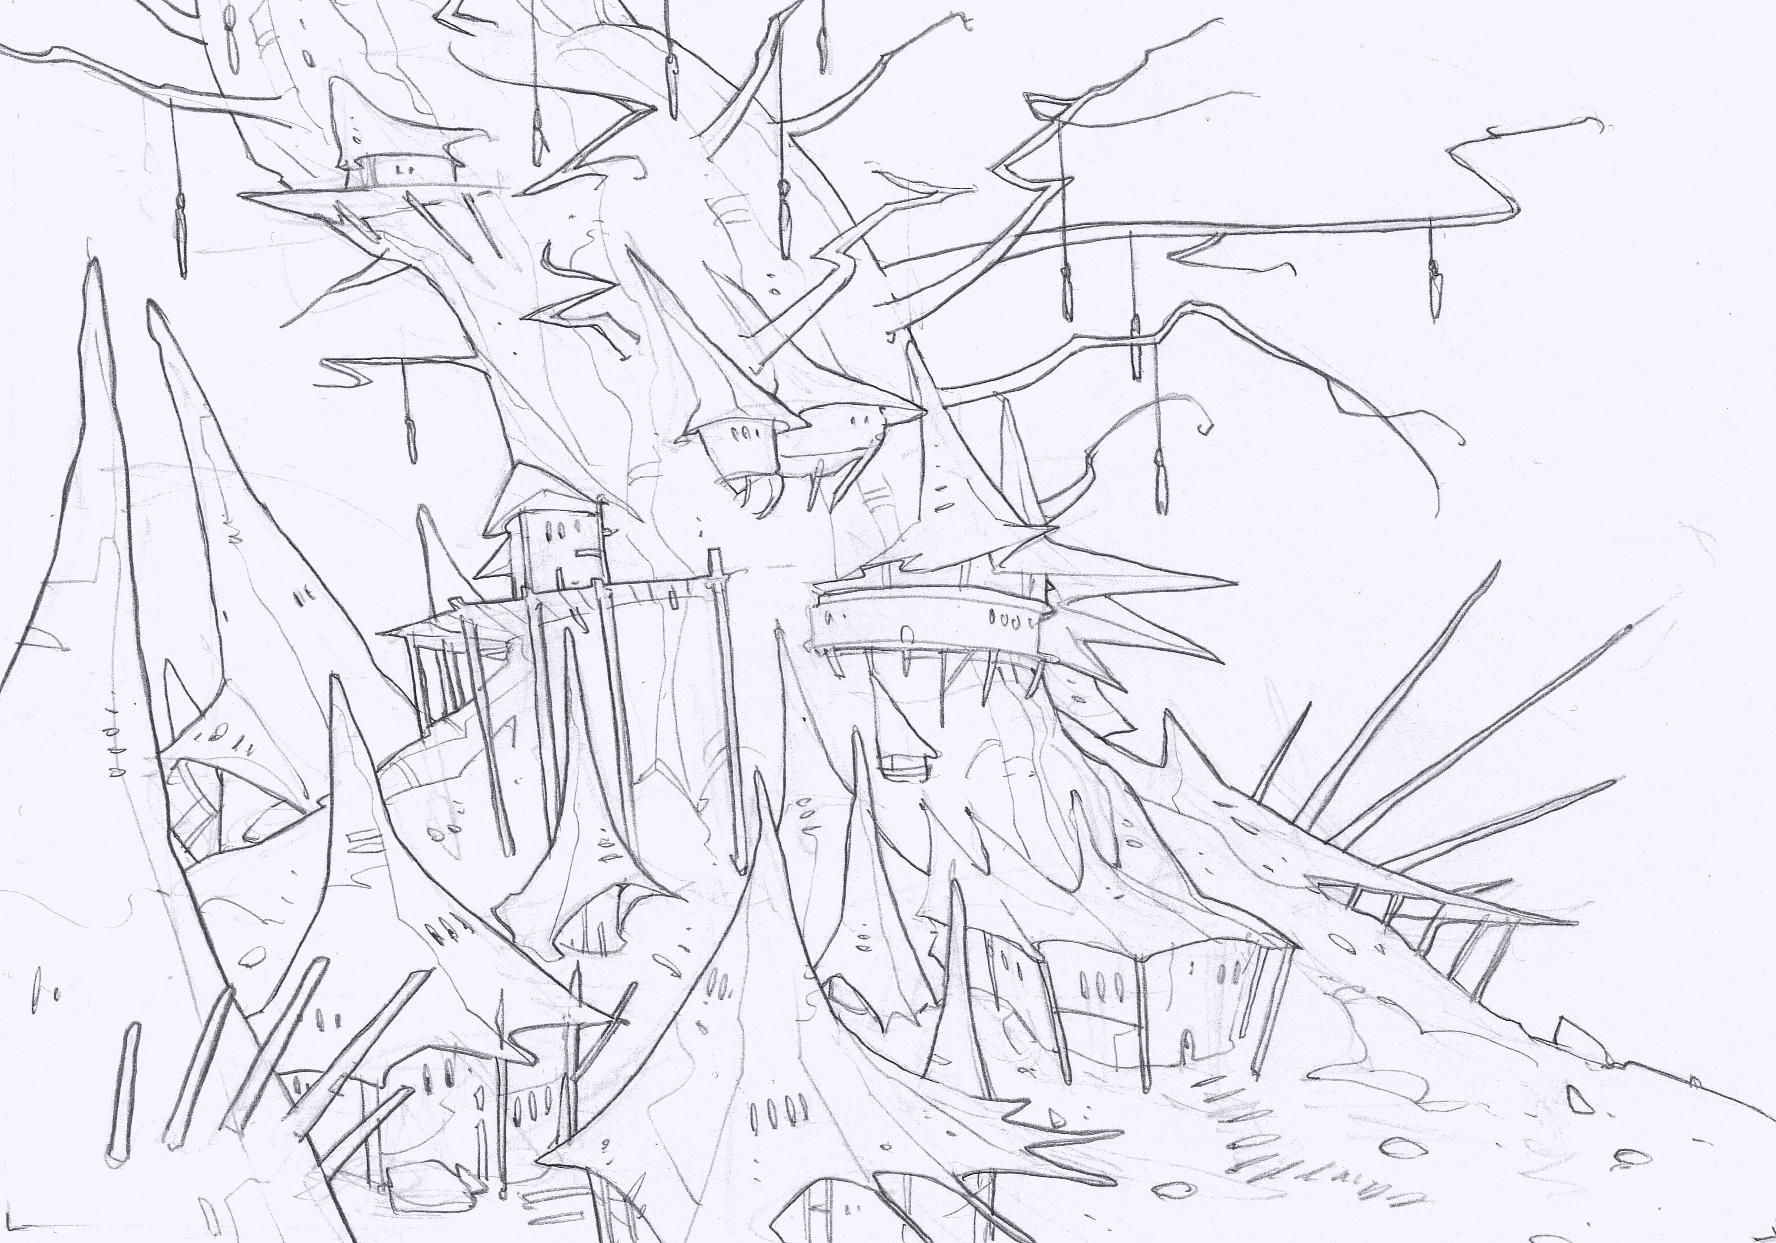 Cool Mini or Not | Wrath of Kings | Edouard Guiton